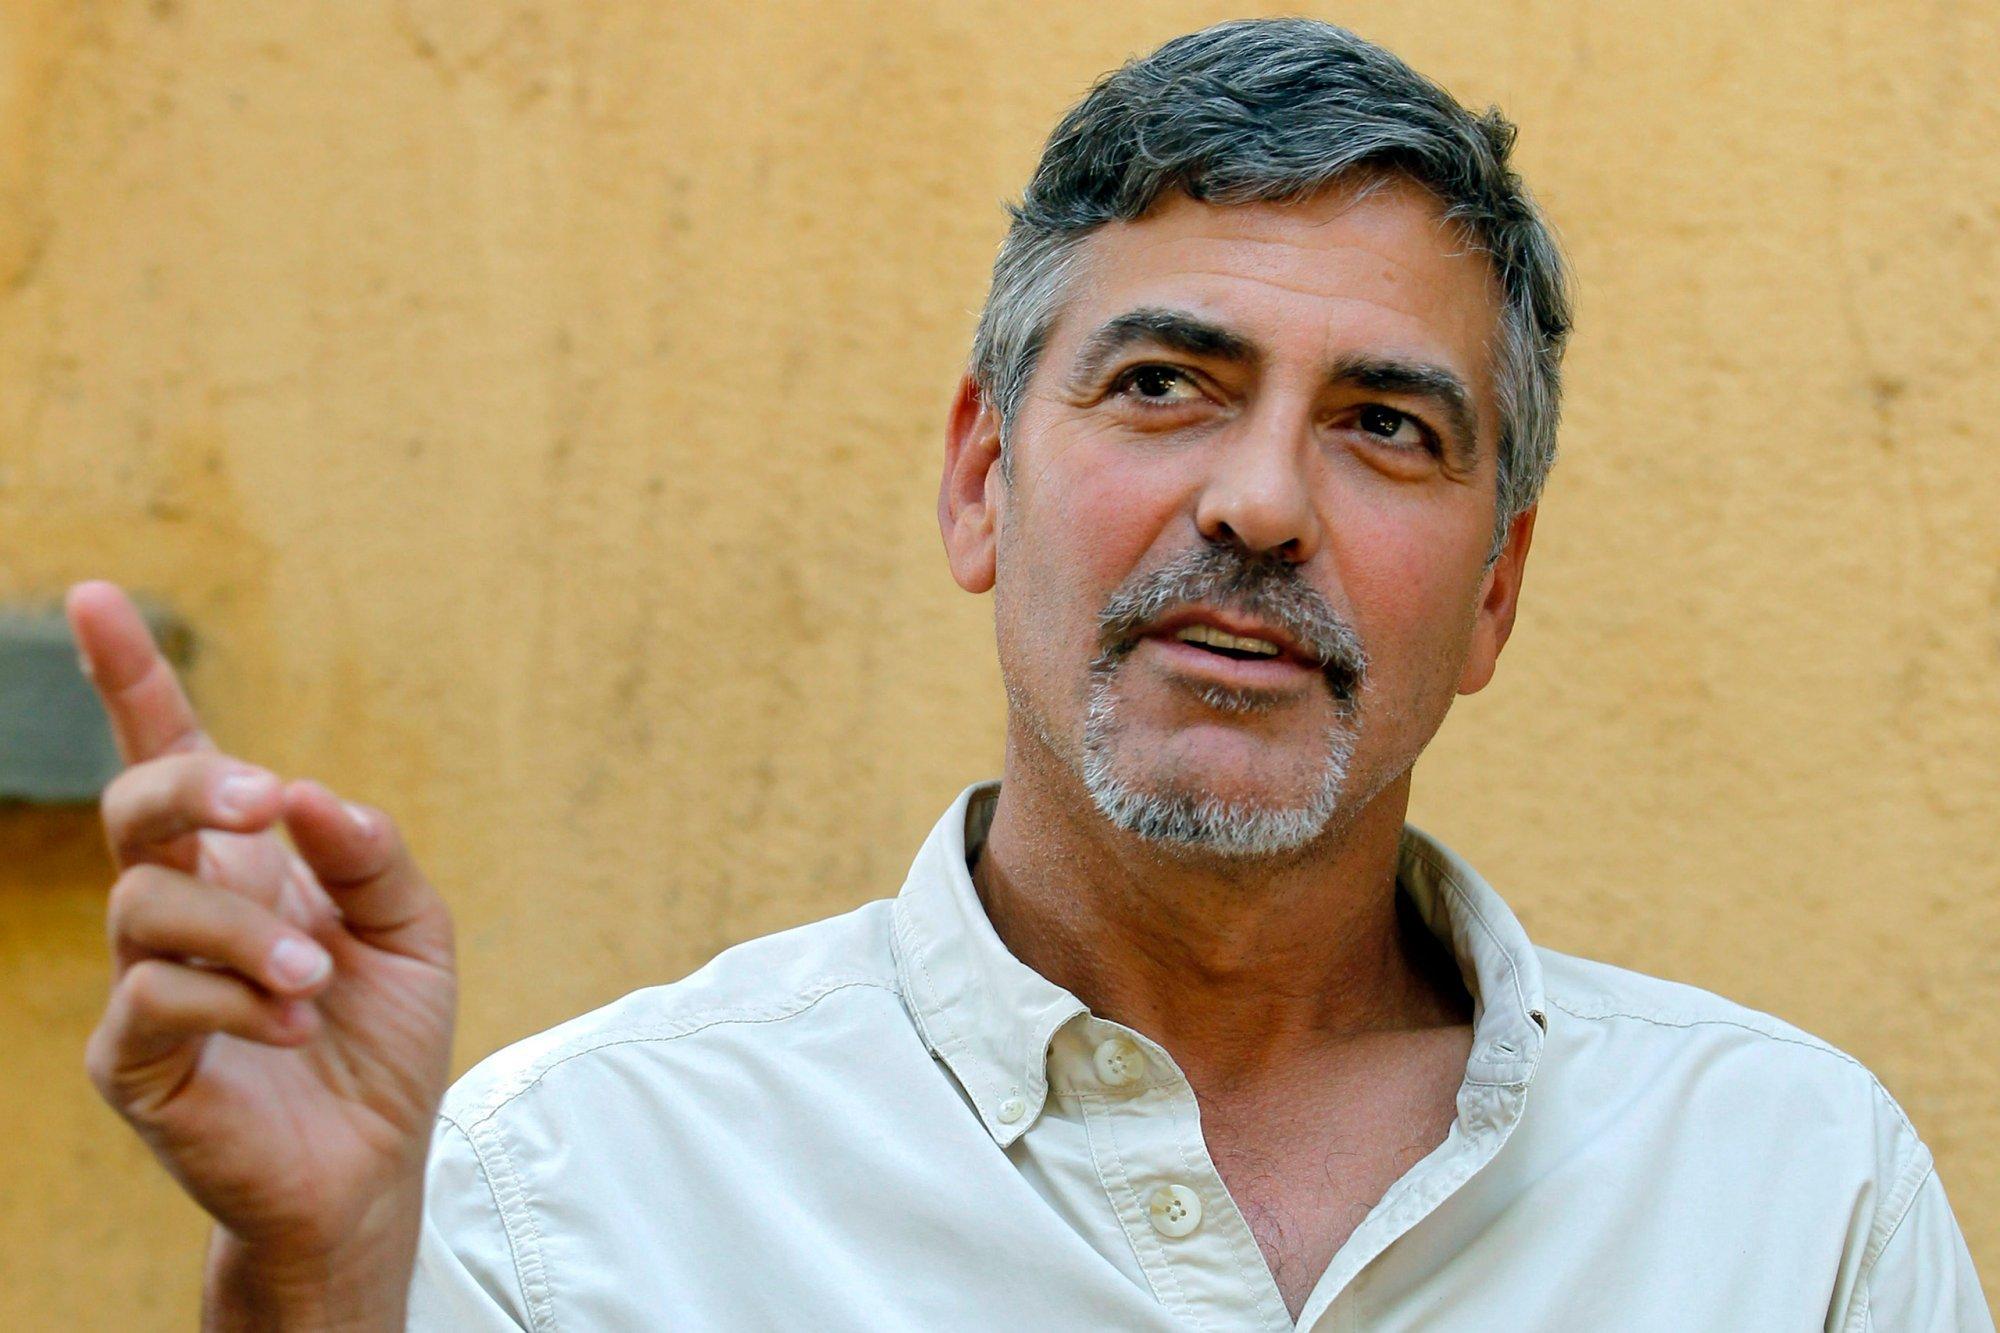 George Clooney Wallpapers Hd